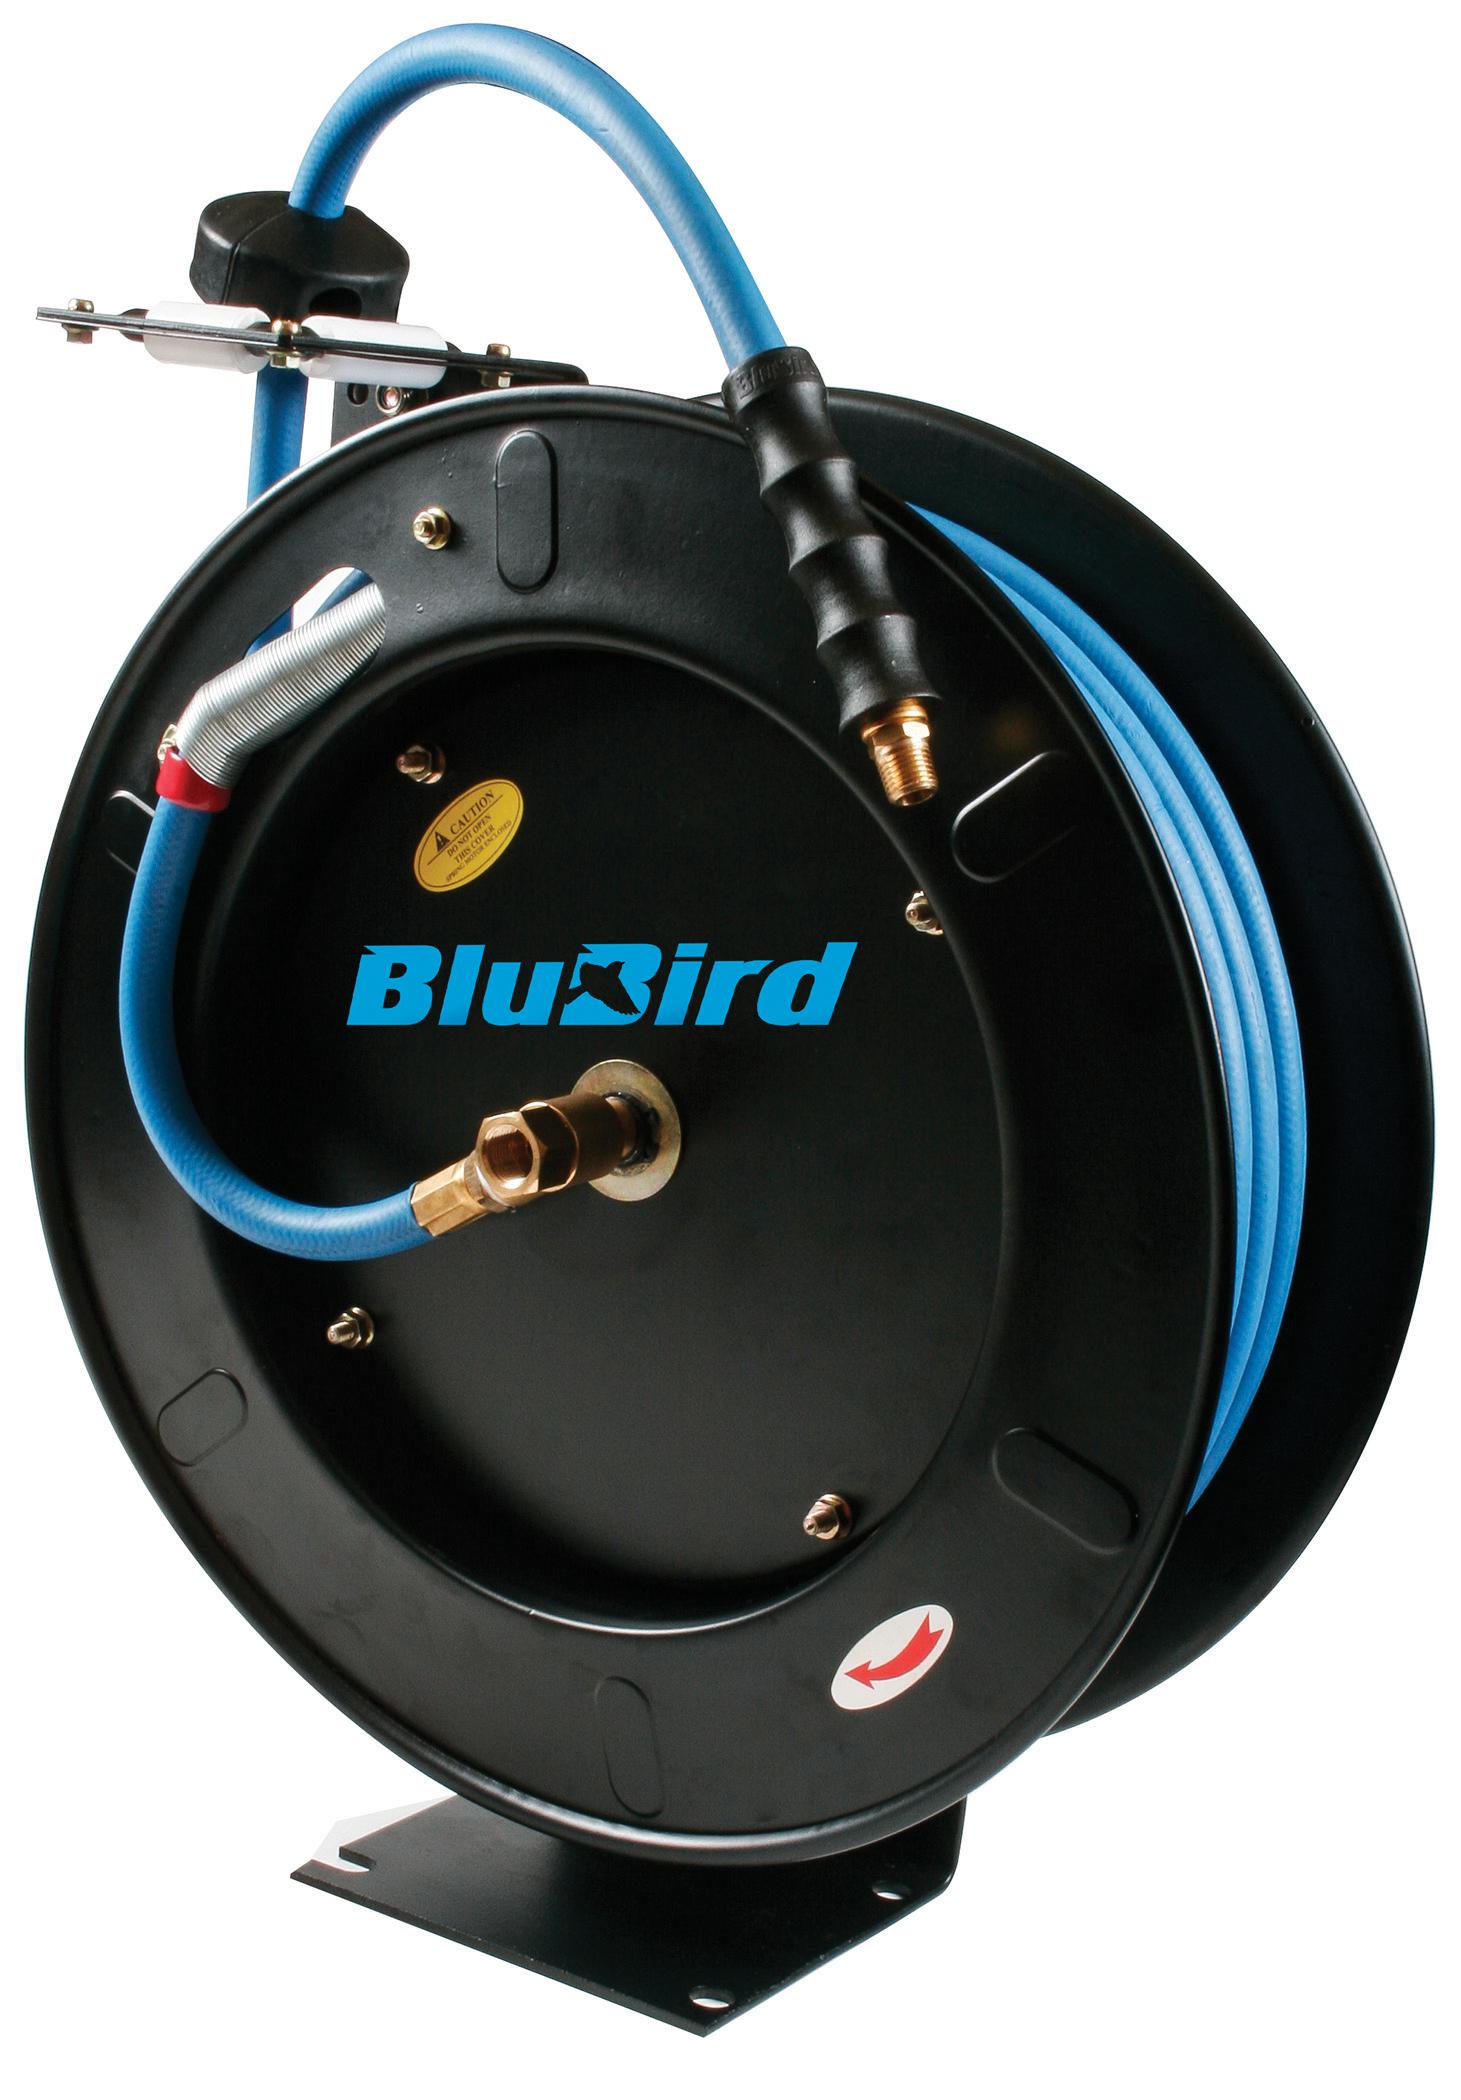 Blubird Air Hose Reel 3 8in. X 50ft. by K Tool International